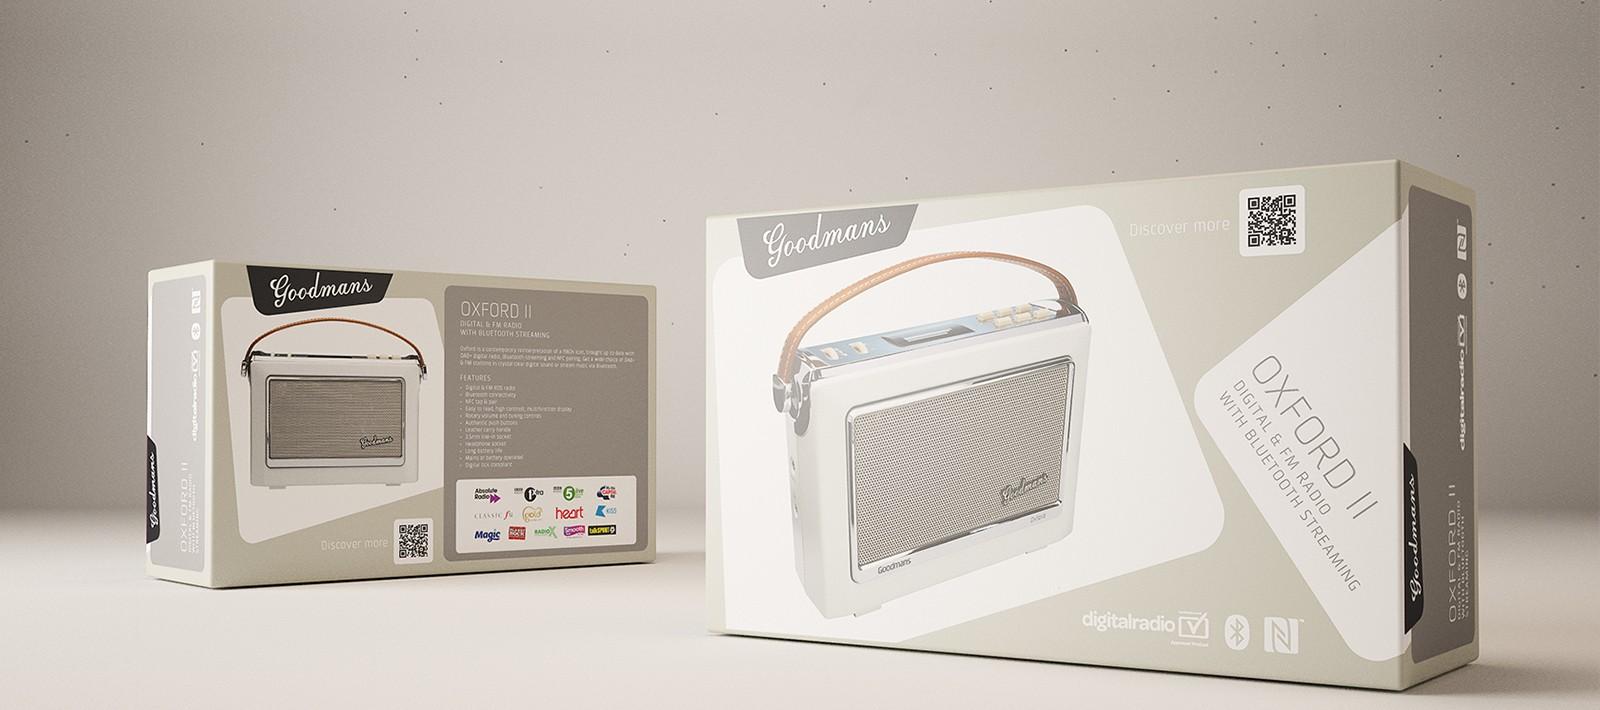 Goodmans-consumer-packaging-design-2